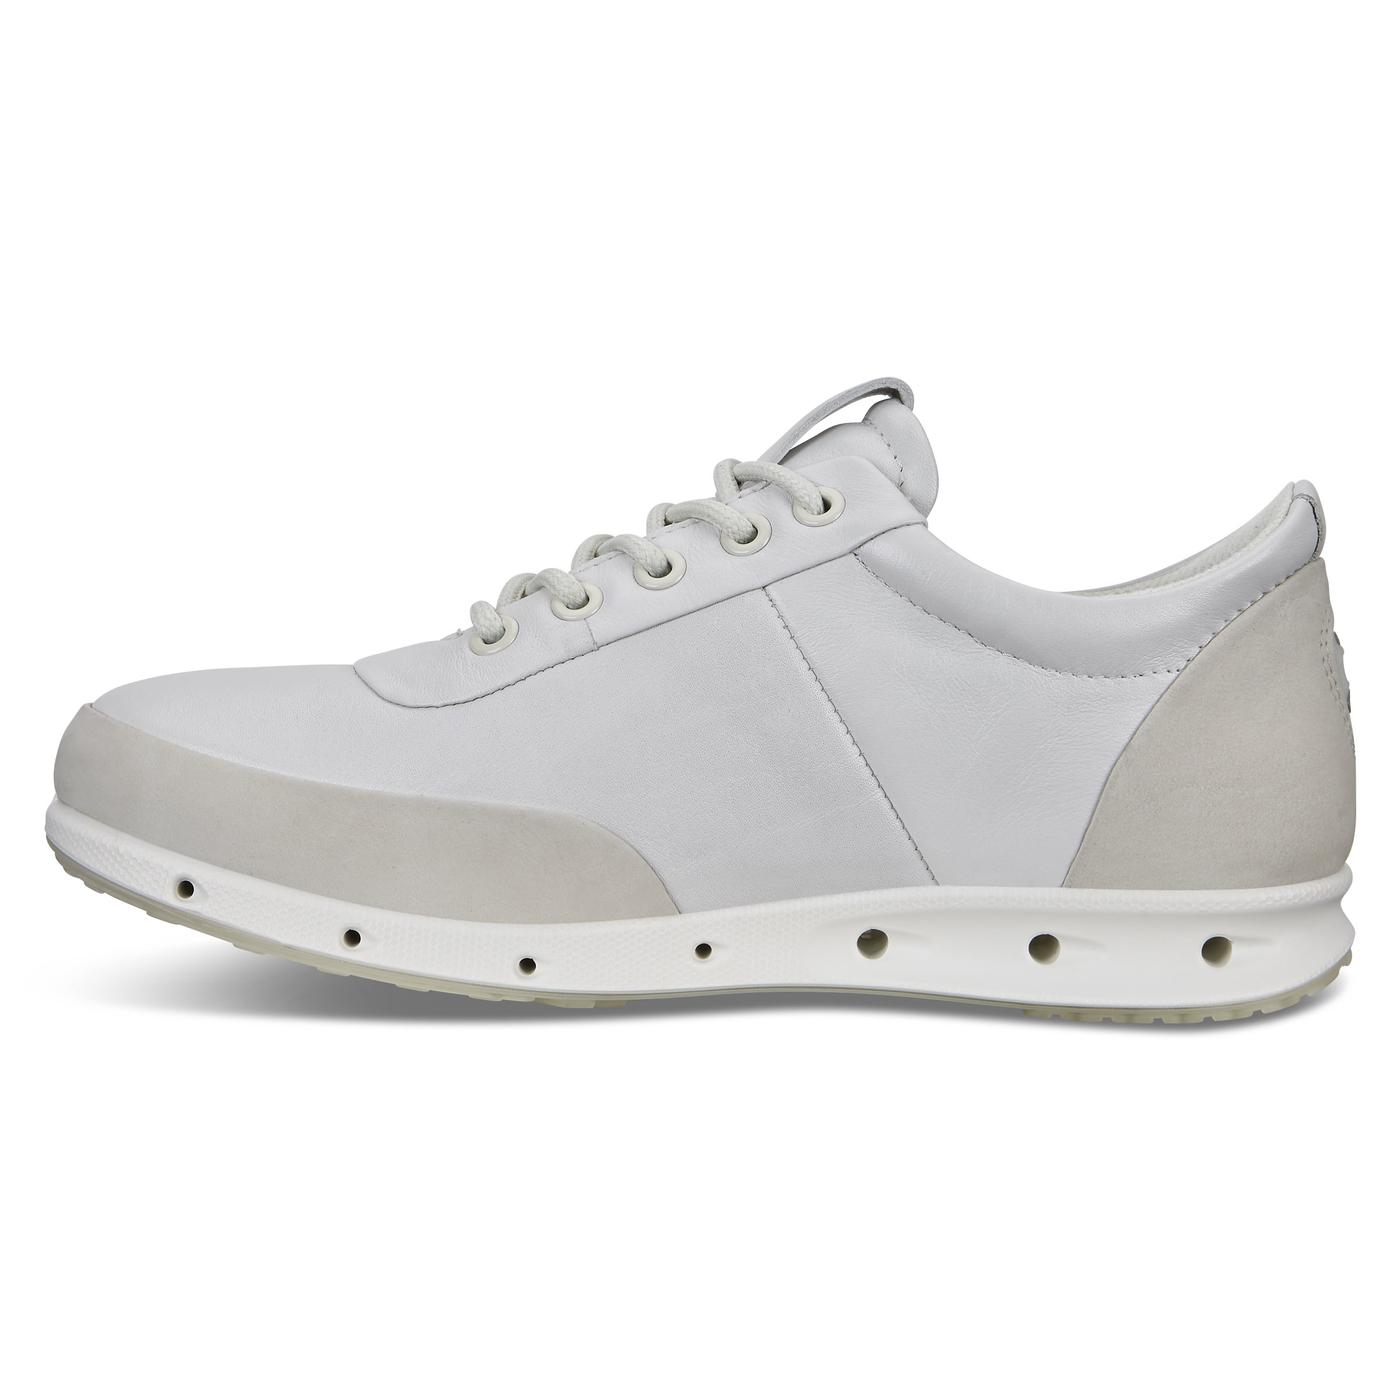 ECCO COOL Womens Sneaker GTX